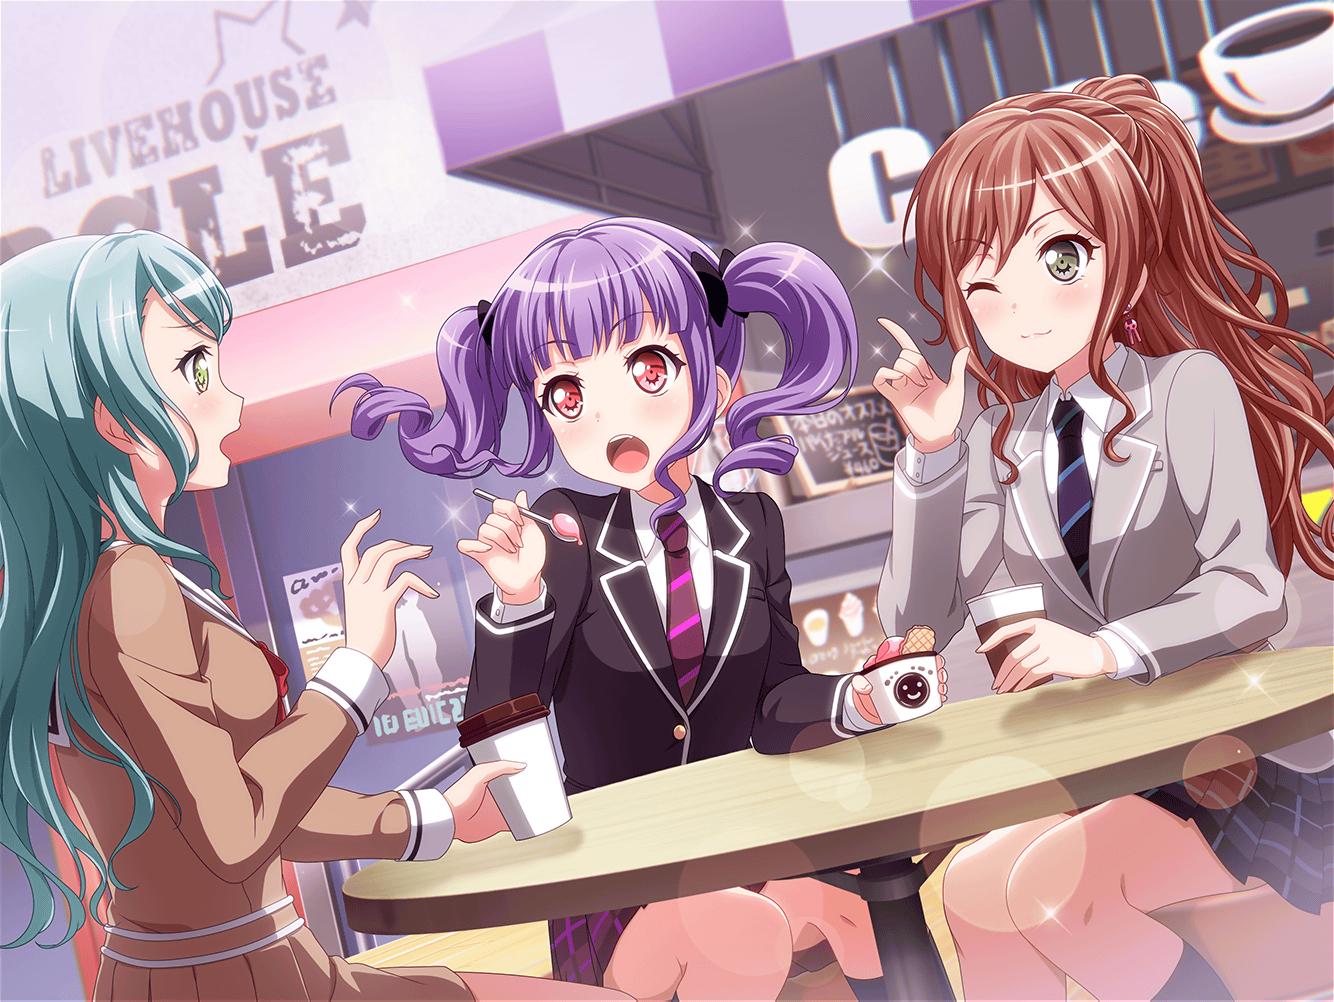 941ako Udagawa Happy Tea Time With Everyone Cbmpf5 Png 1334 1002 Anime Best Friends Friend Anime Anime Friendship